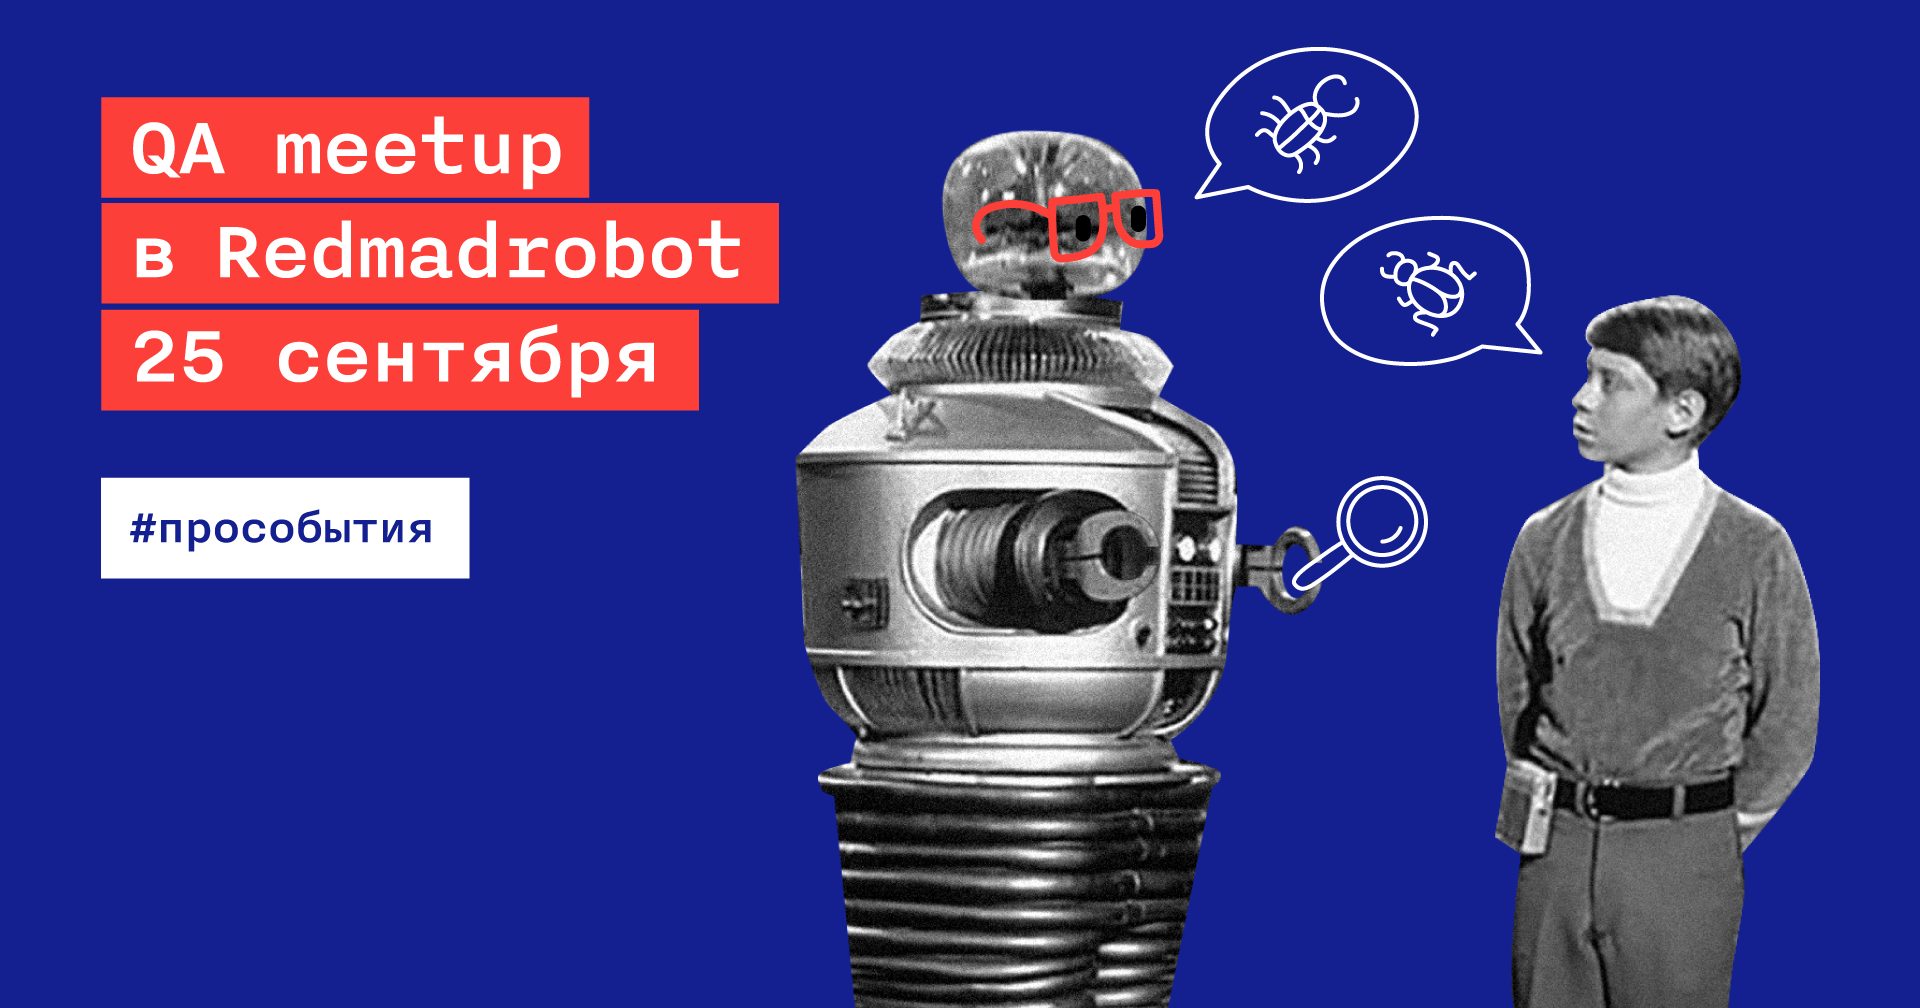 QA Mitap in Redmadrobot